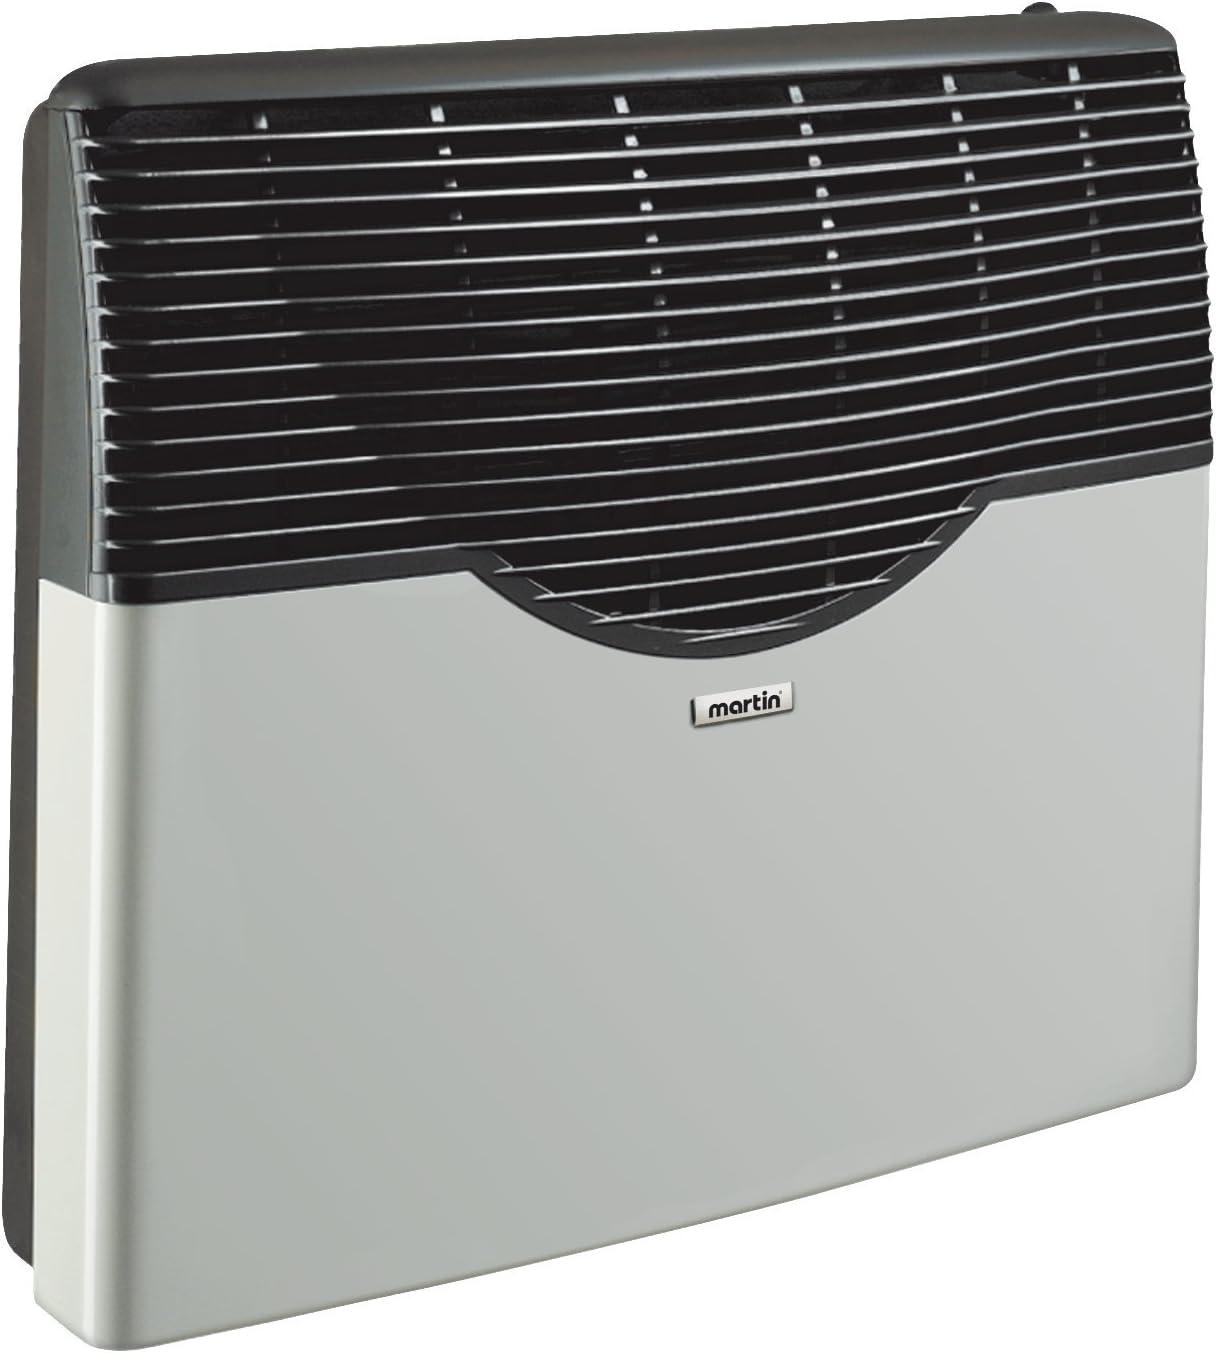 martin direct vent propane wall heater